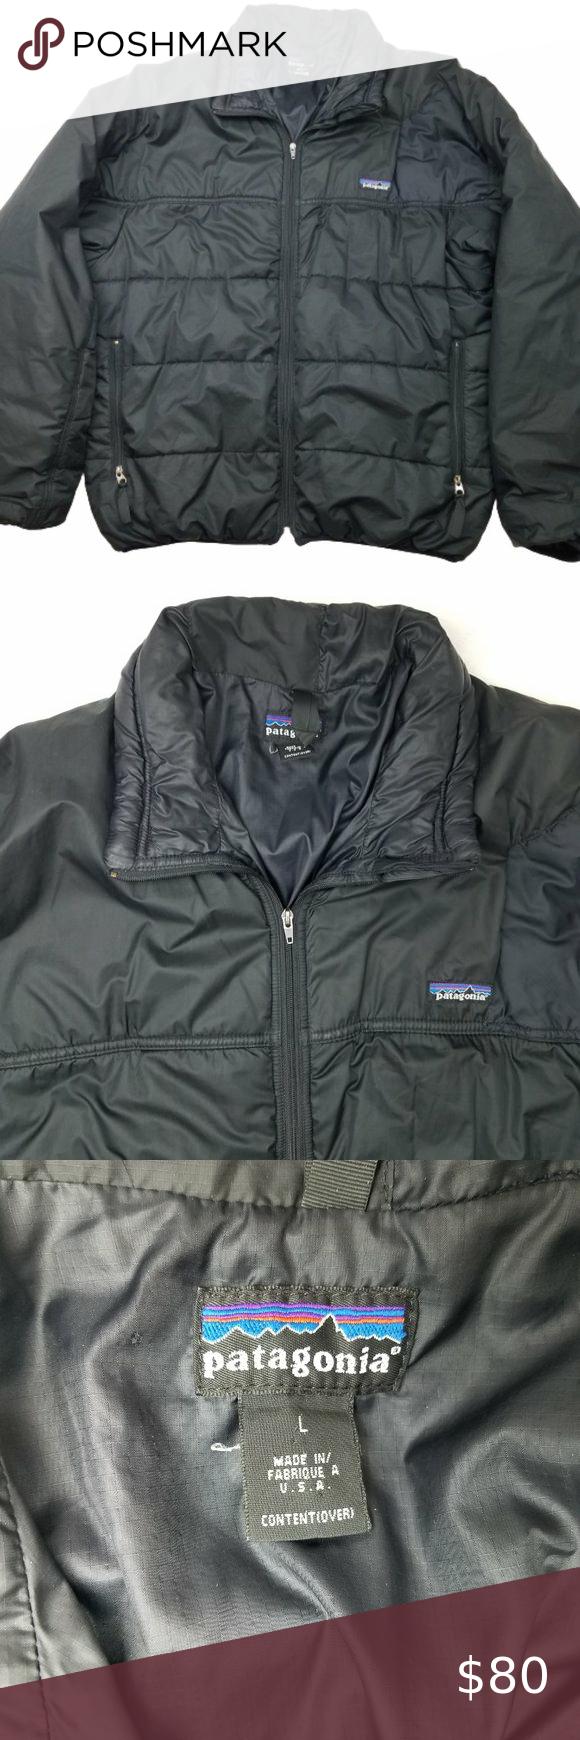 Patagonia Black Puffer Jacket Coat Large Men S Vintage Patagonia Black Puffer Insulated Jacket The Jacket Is I Black Puffer Jacket Black Puffer Clothes Design [ 1740 x 580 Pixel ]